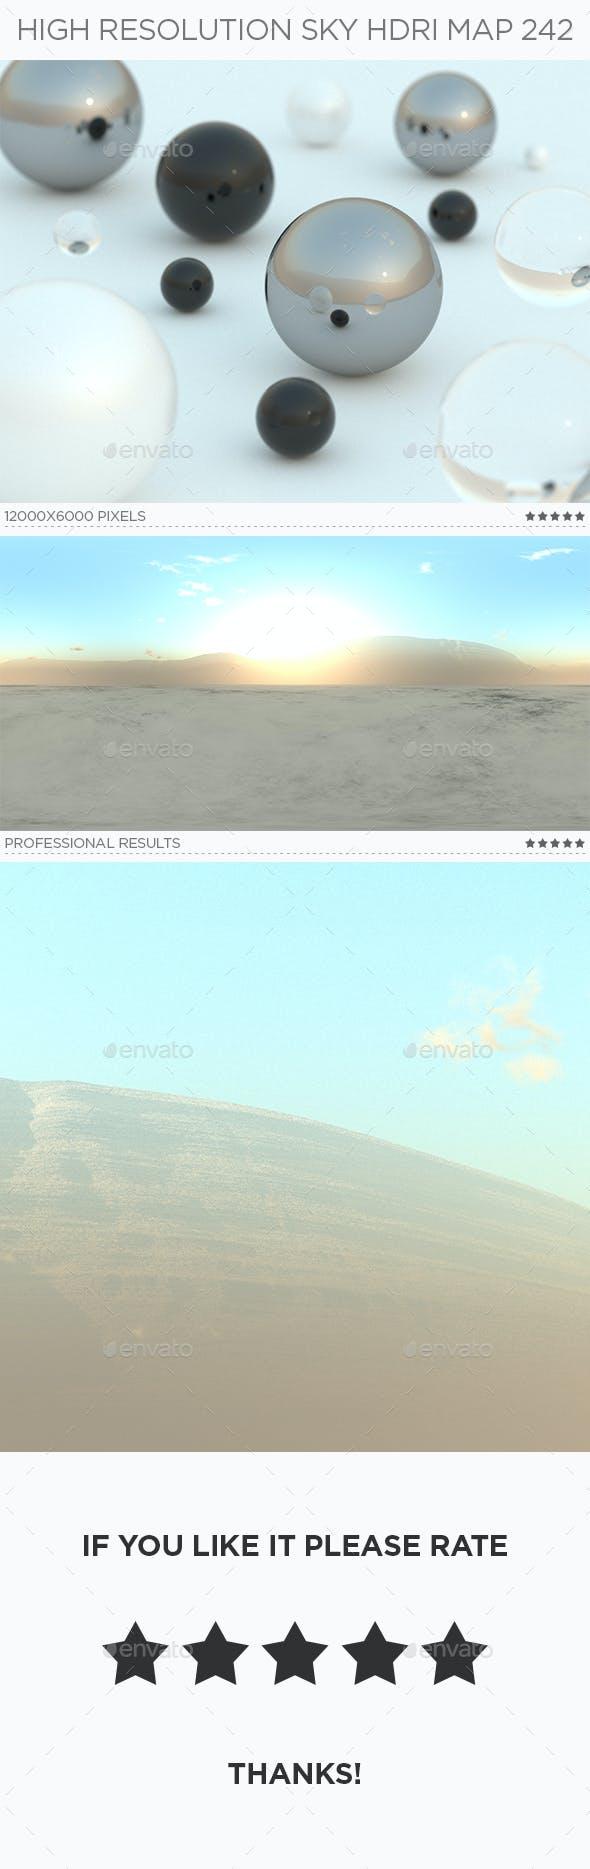 High Resolution Sky HDRi Map 242 - 3DOcean Item for Sale